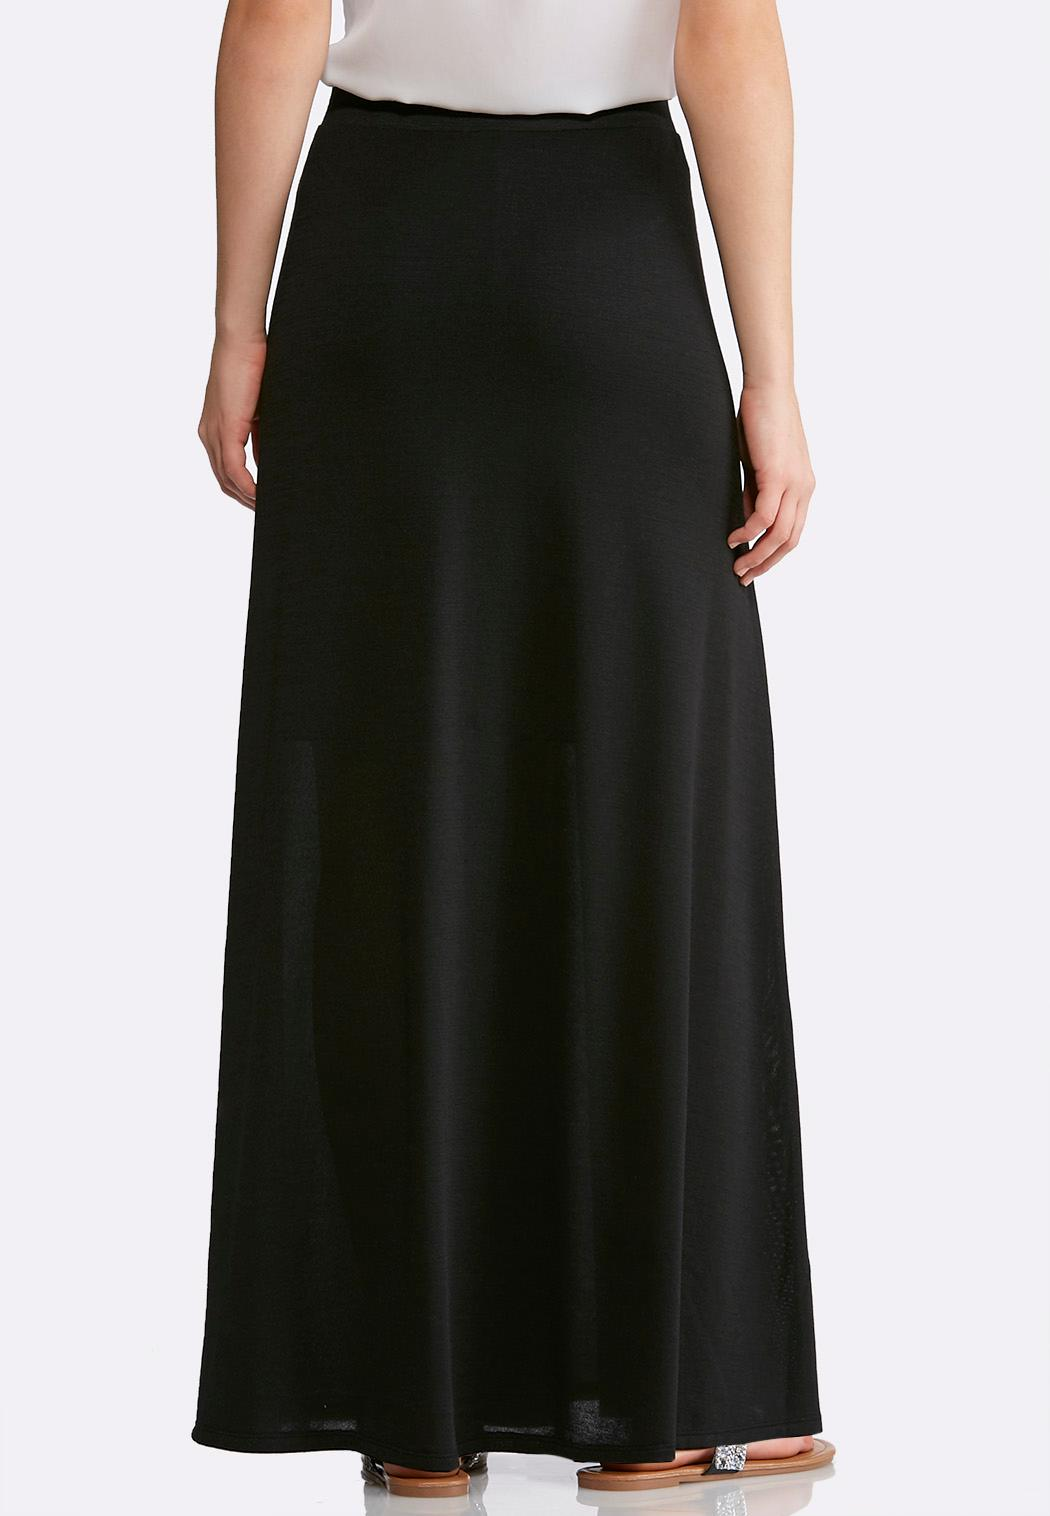 Black Hacci Maxi Skirt (Item #43994351)